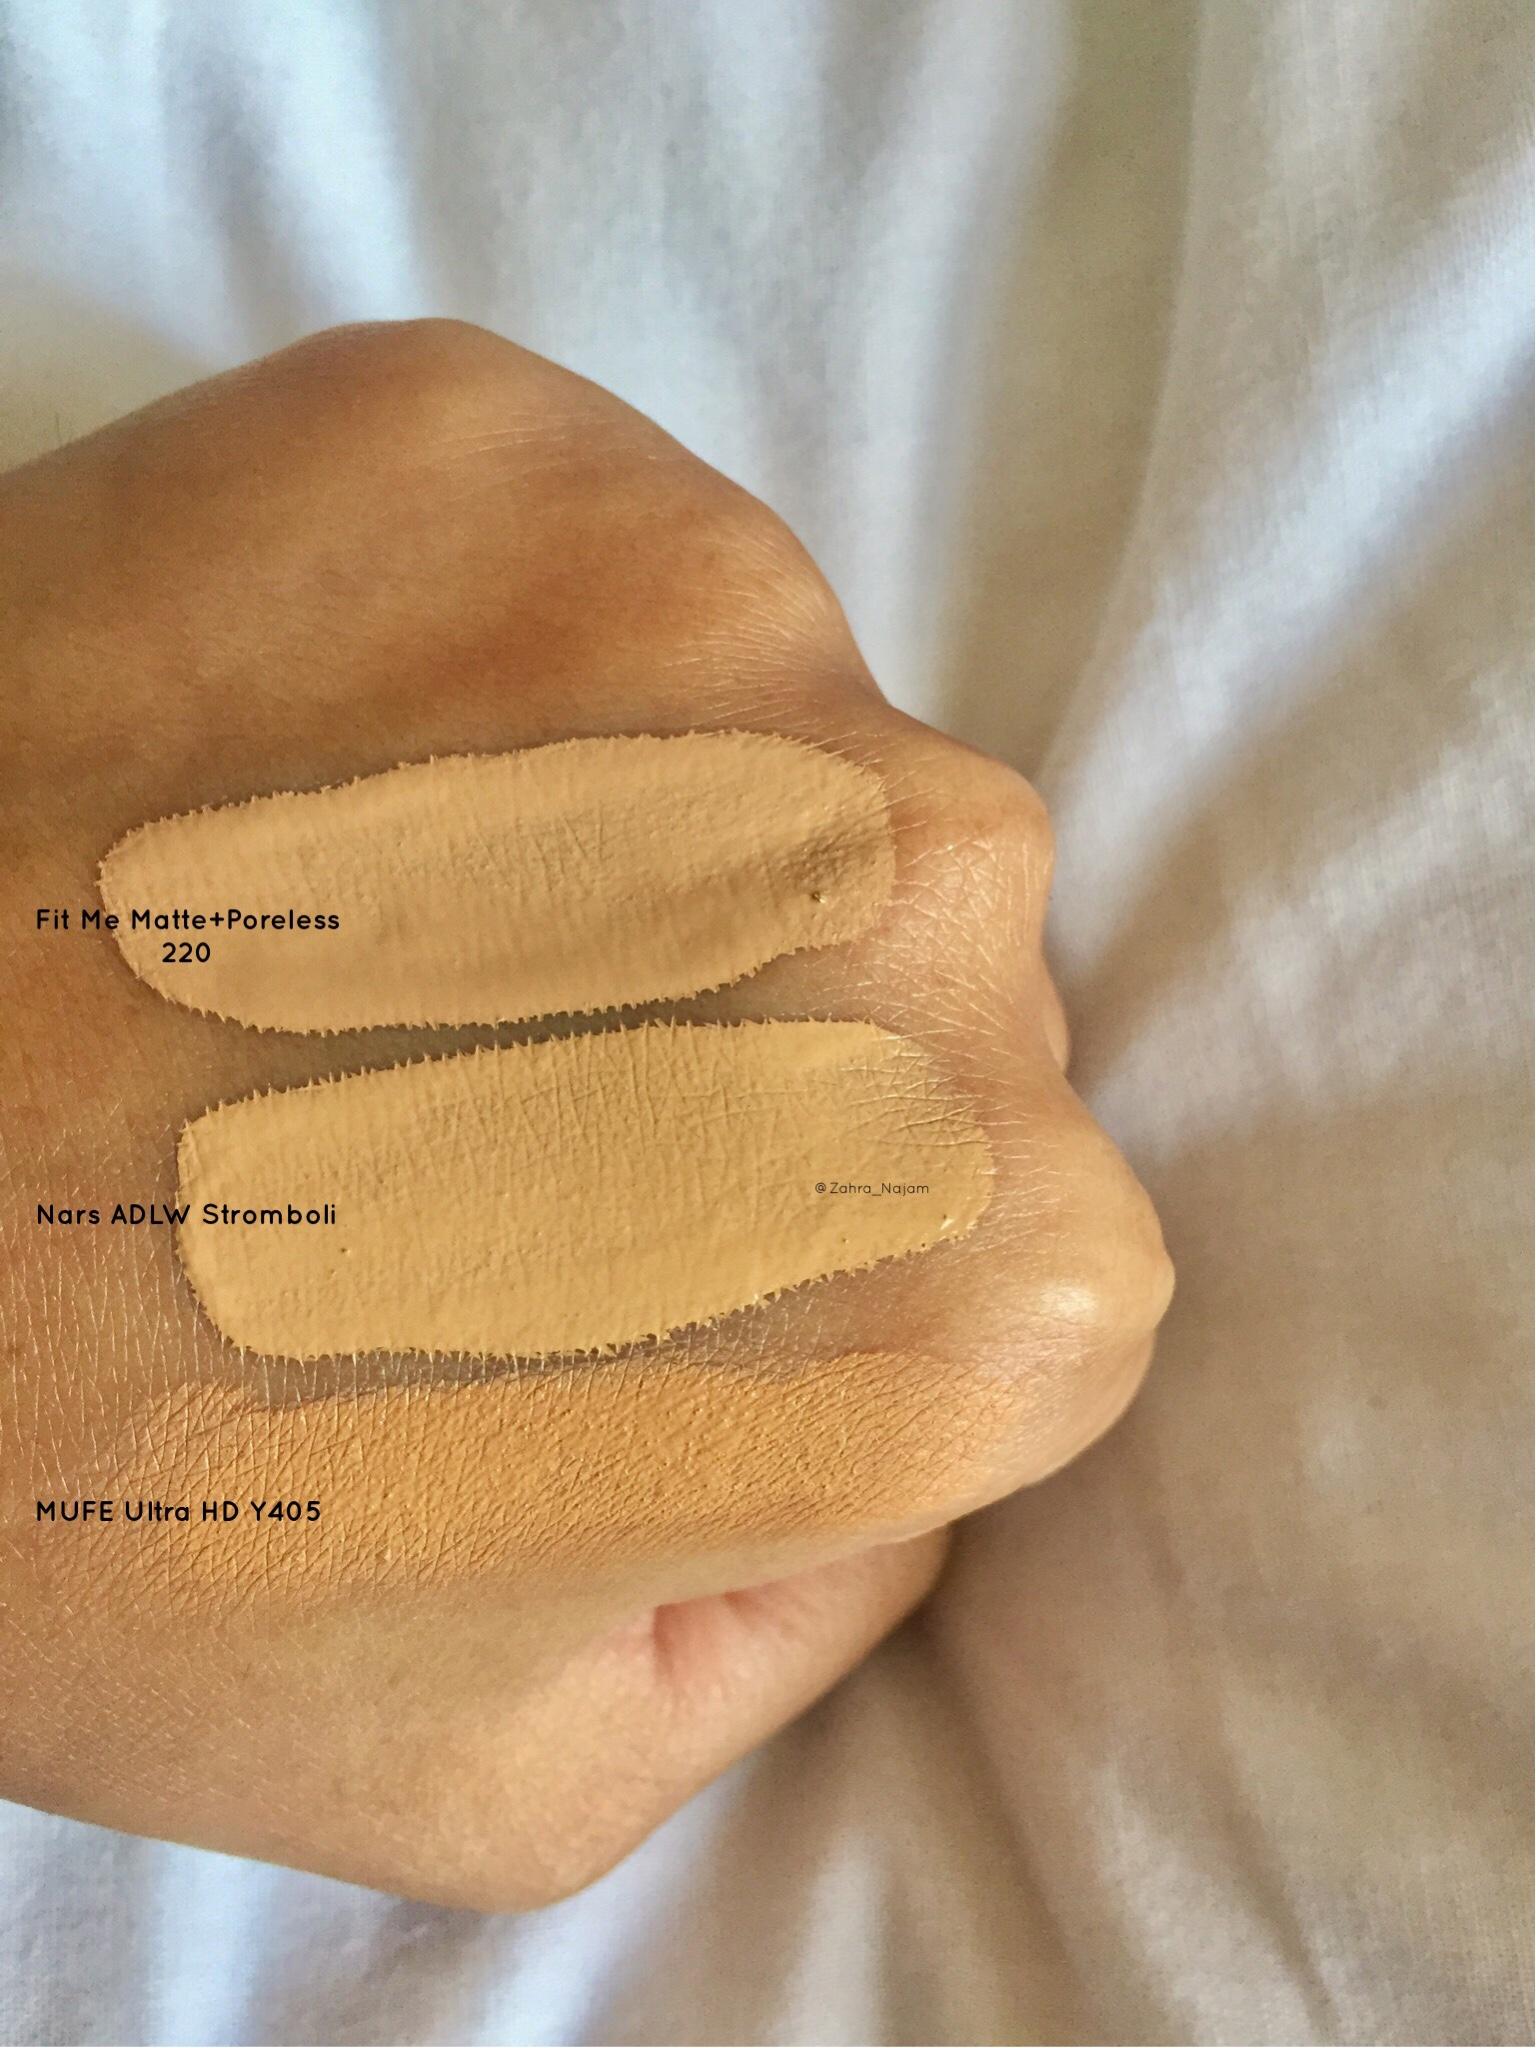 Mufe Hd Ultra Fluid Foundation In Y405 Golden Honey